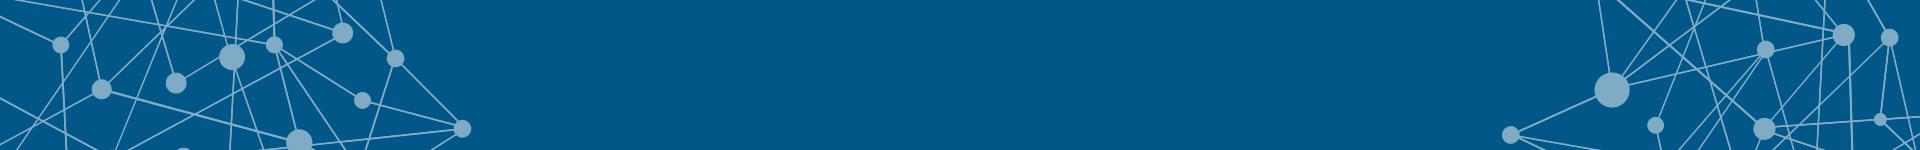 eti-software-solutions-pagebanner-alcadis